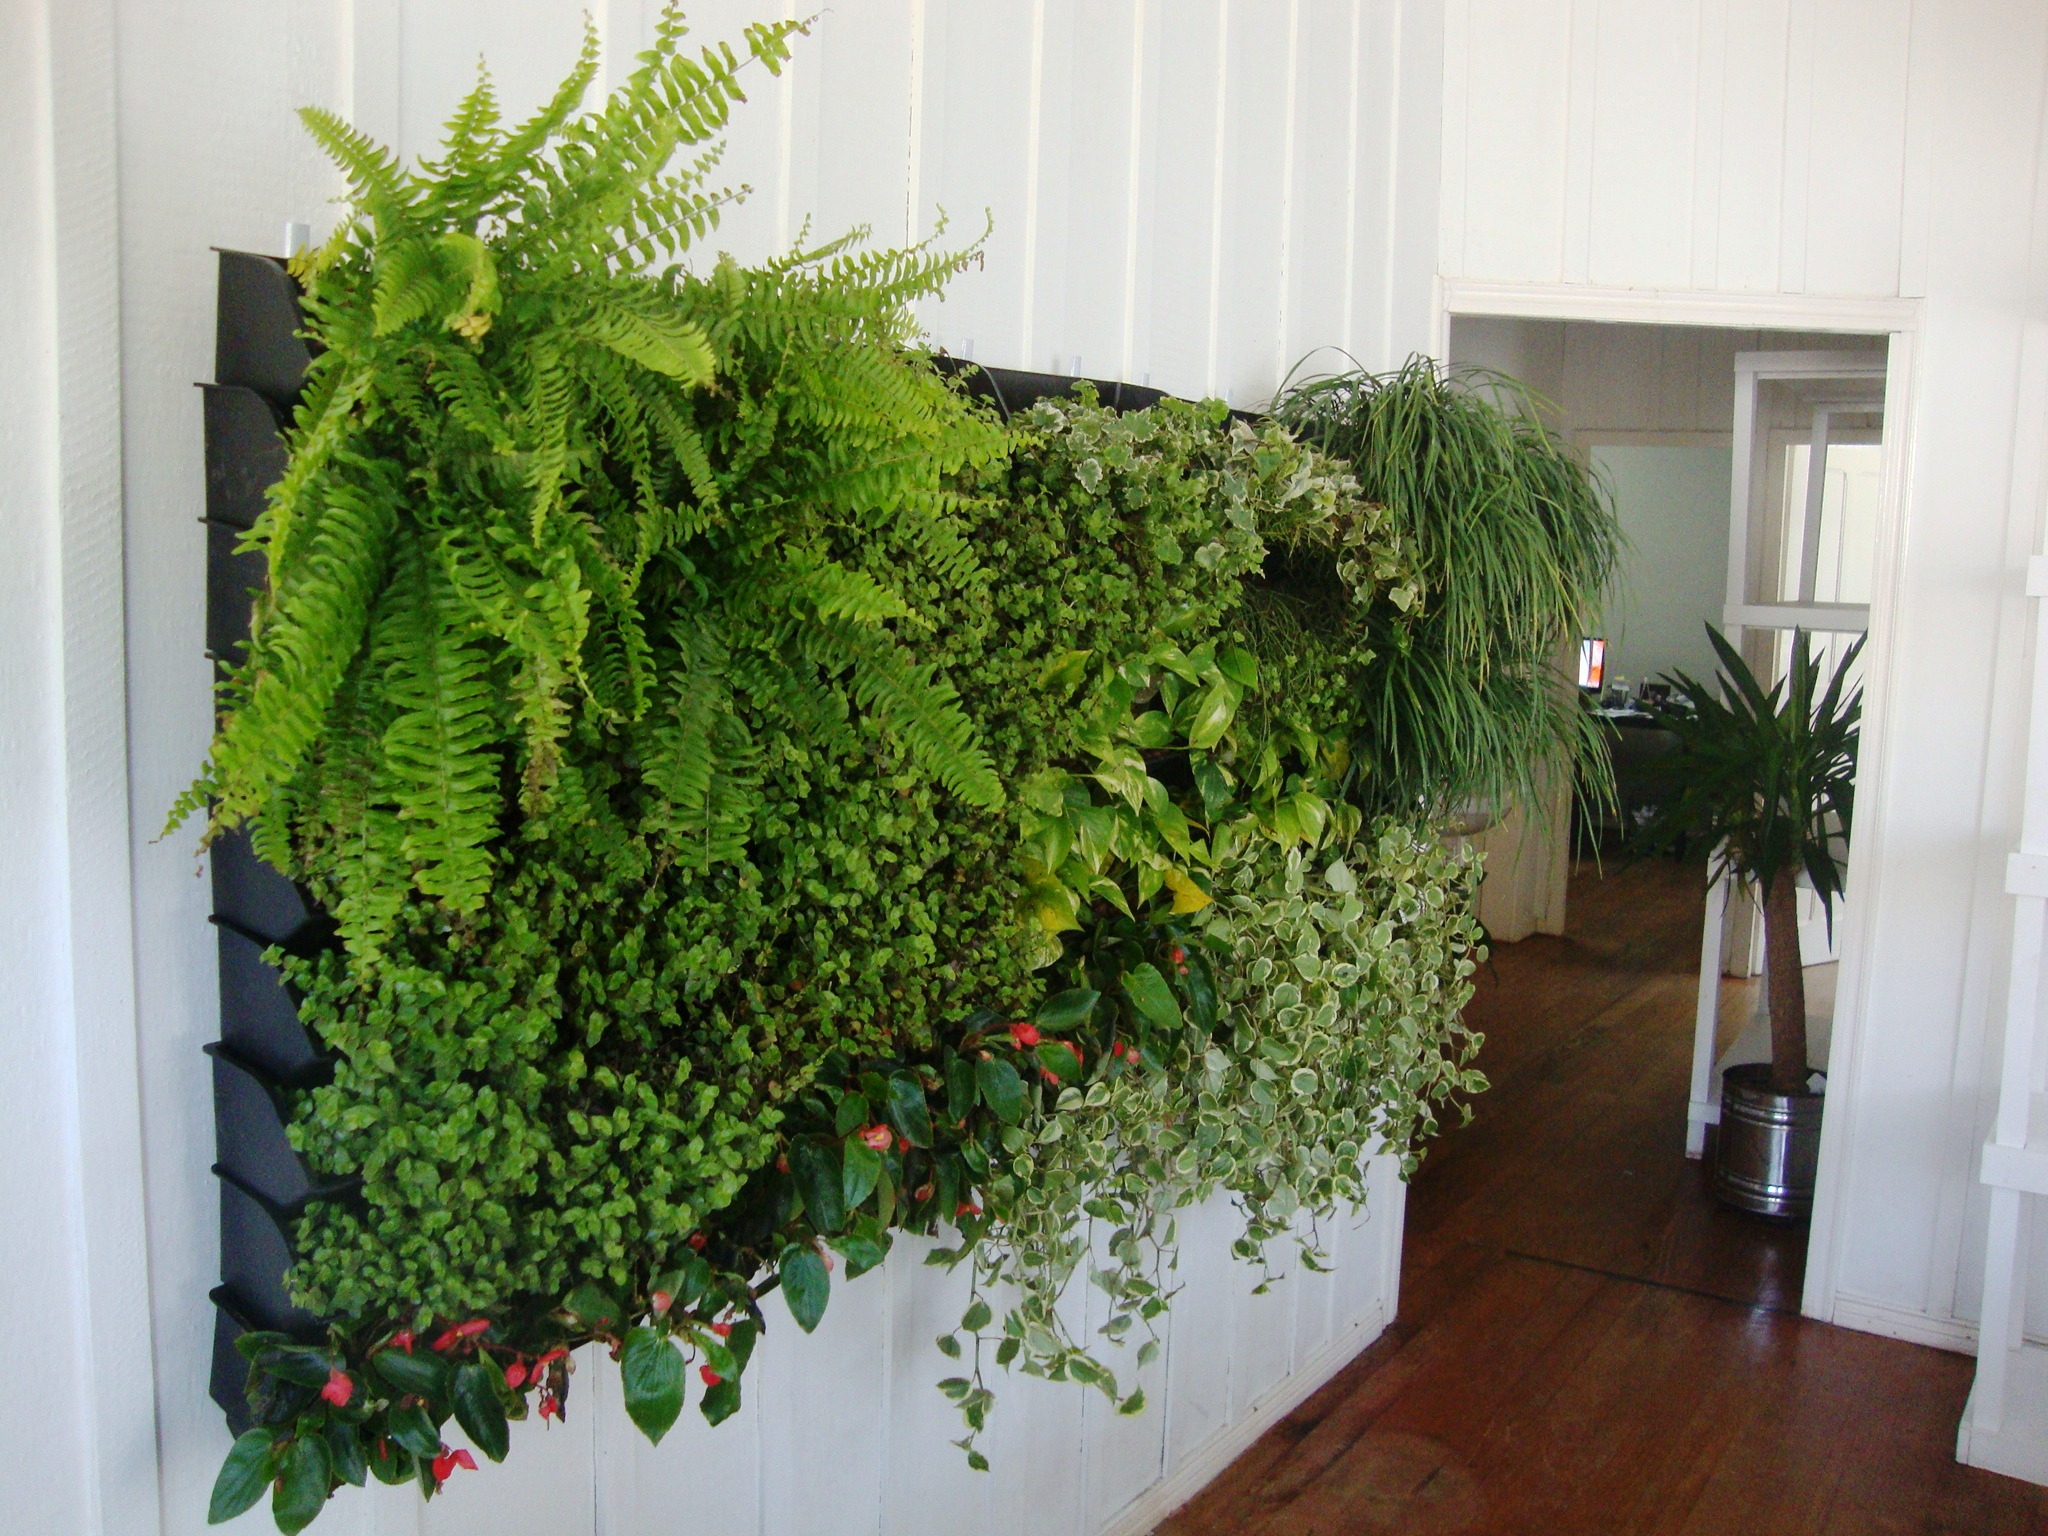 Nomes de plantas para jardim Decorando Casas